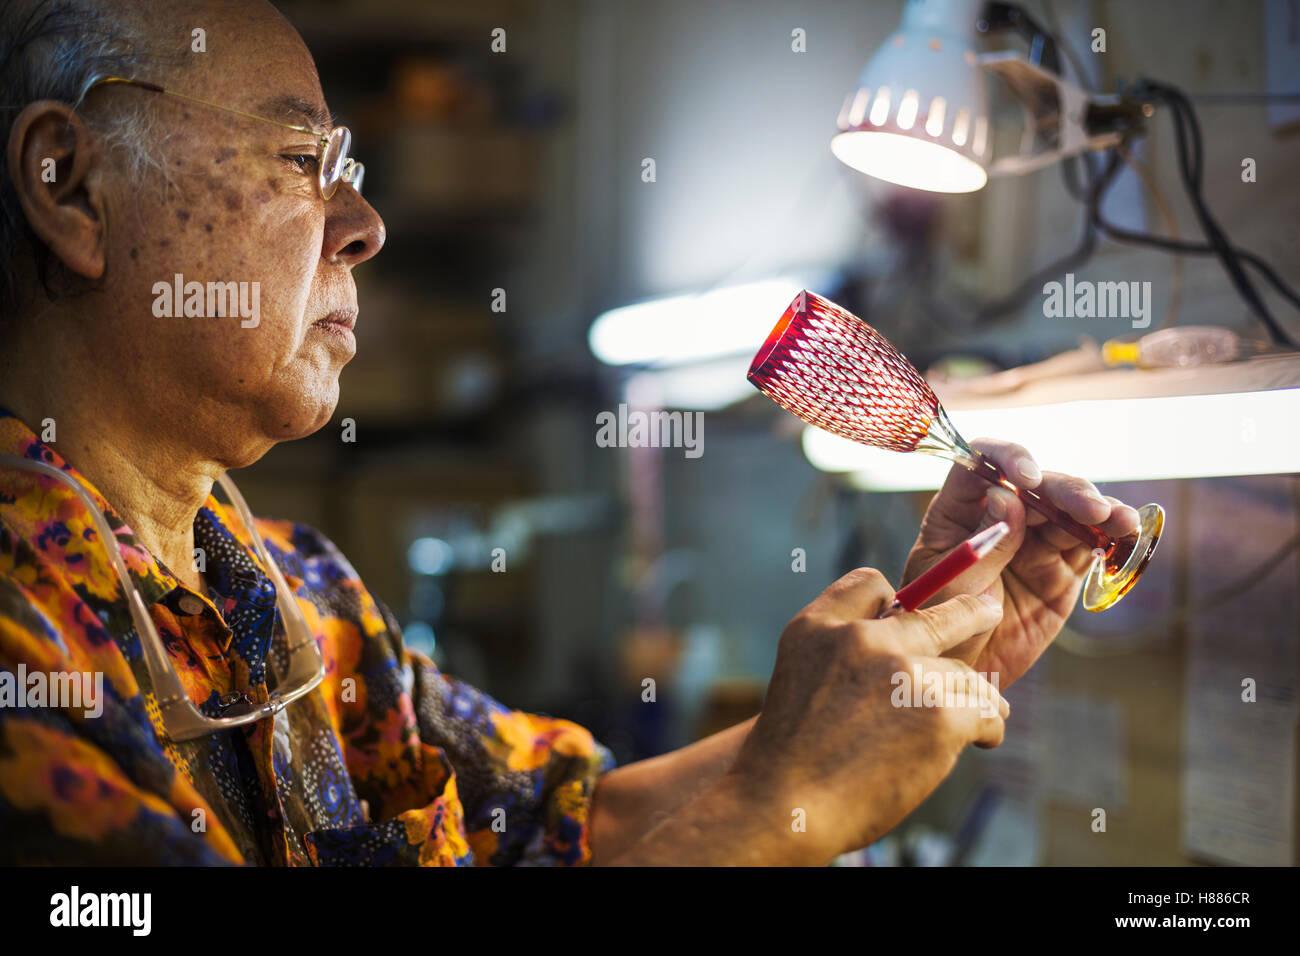 A senior craftsman at work in a glass maker's studio workshop. - Stock Image